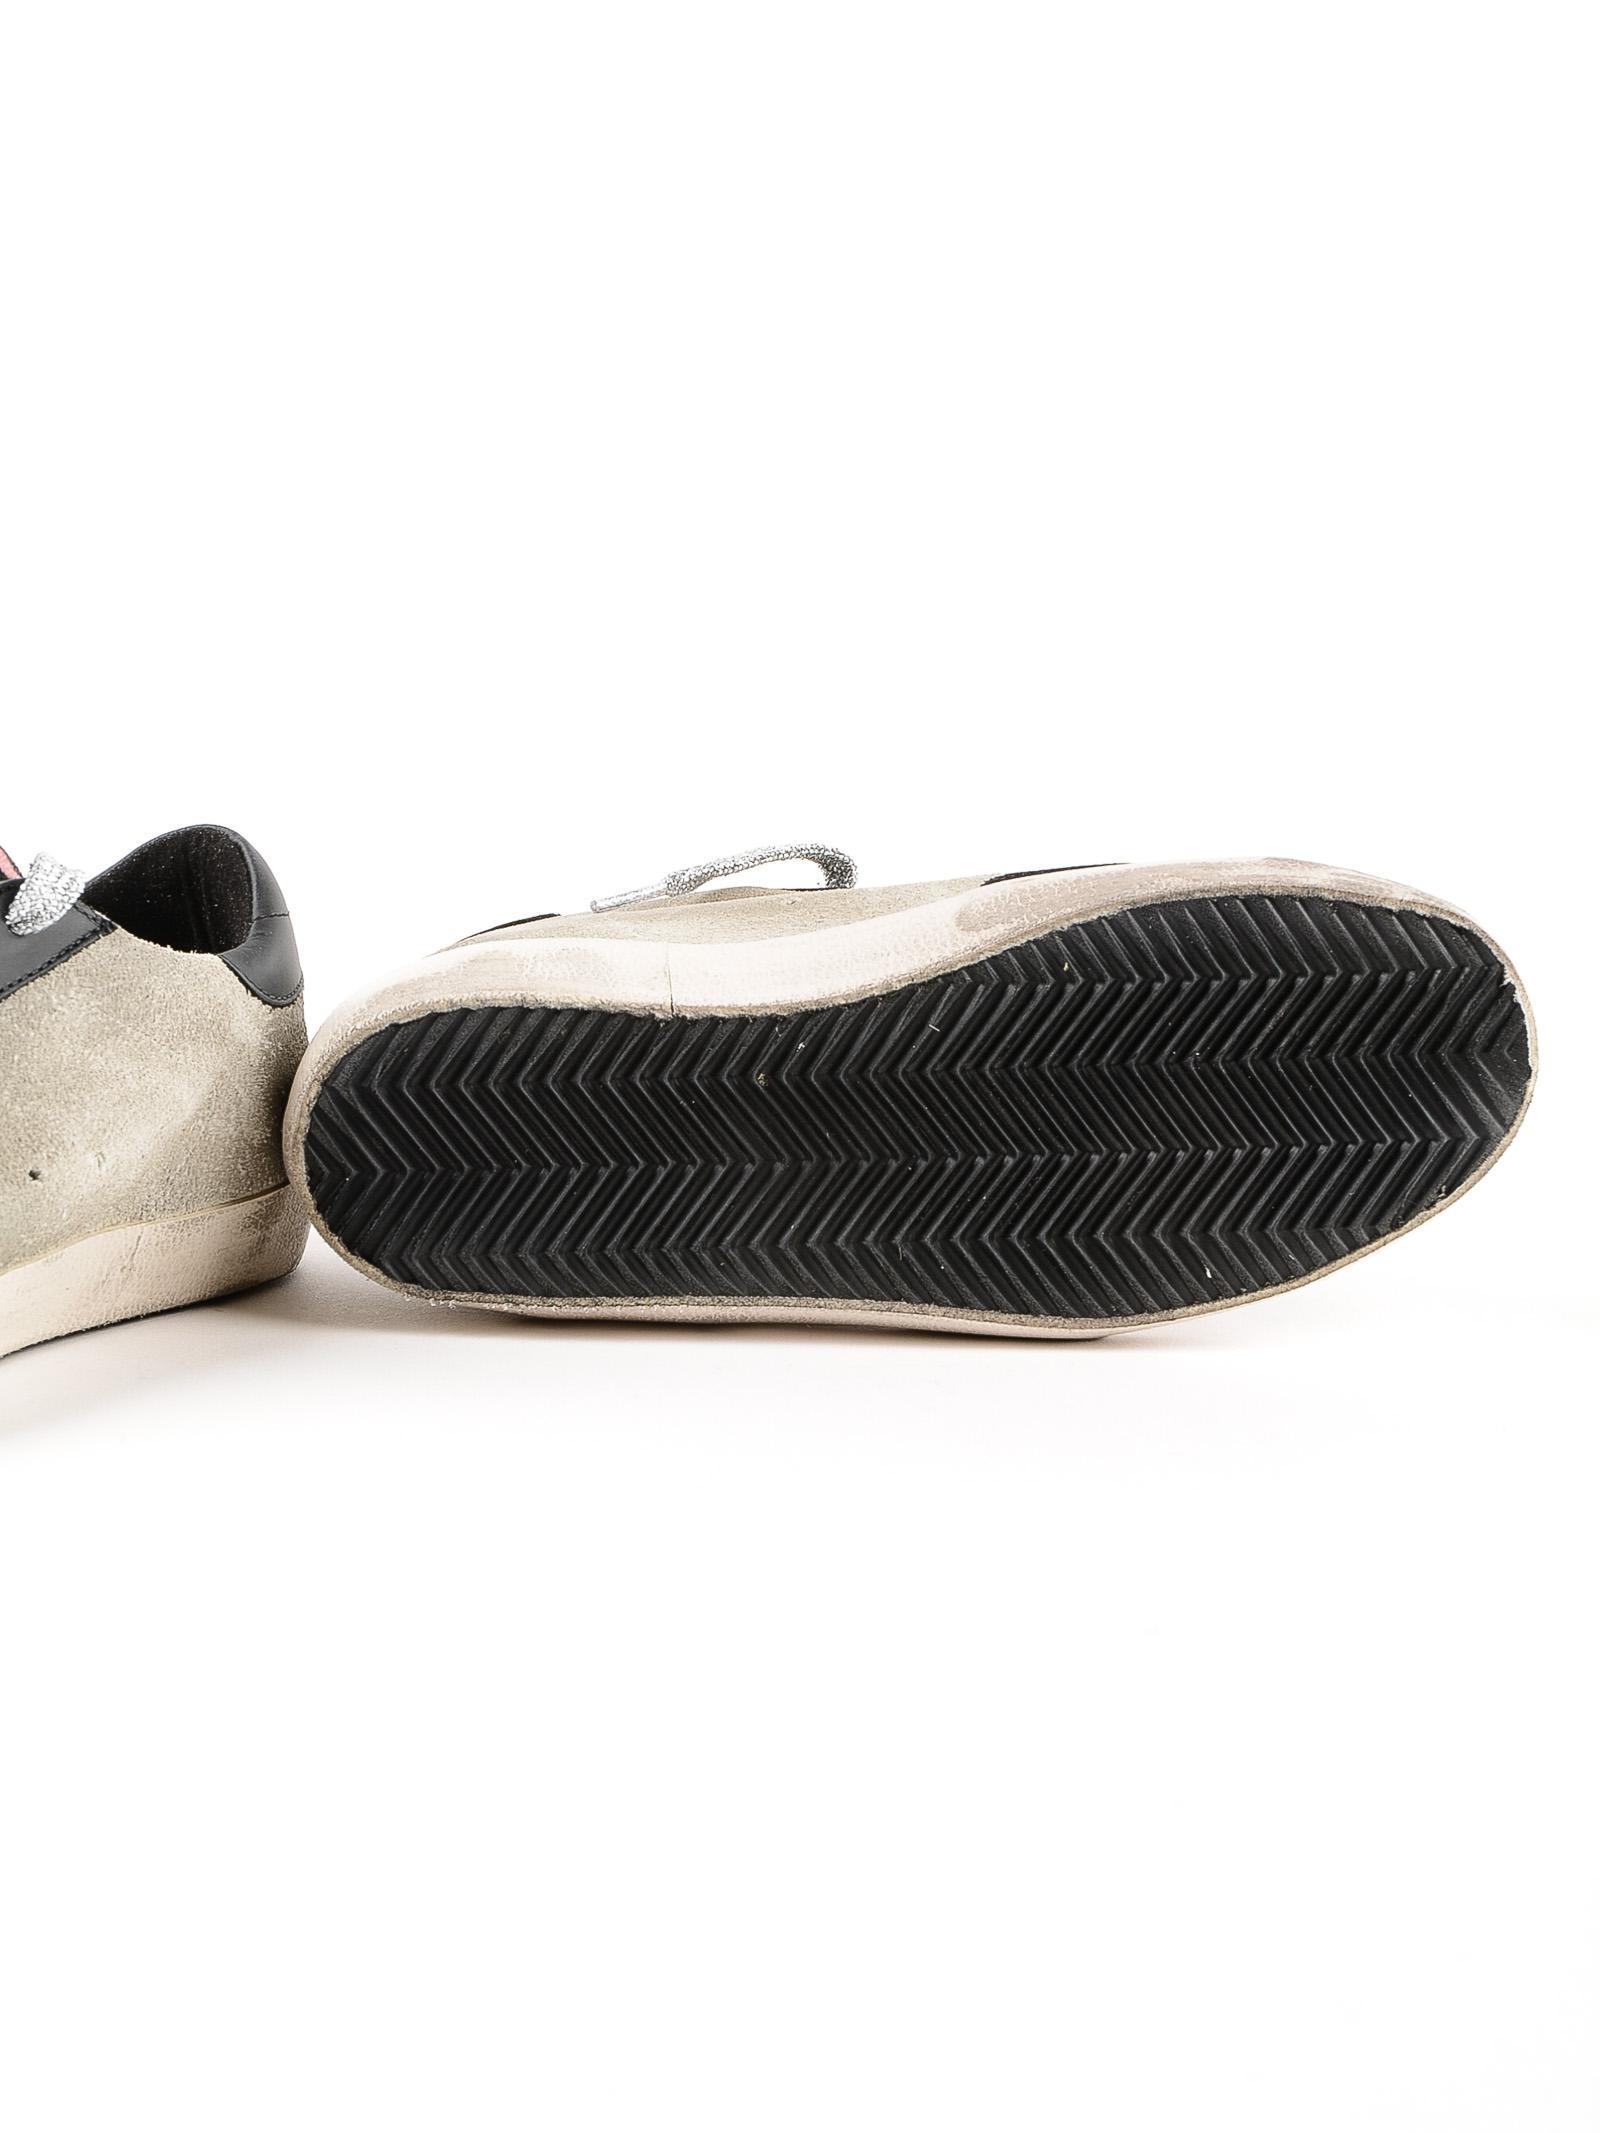 0c67a7a5a46d Lyst - Golden Goose Deluxe Brand Sneakers Superstar Pink Zebra